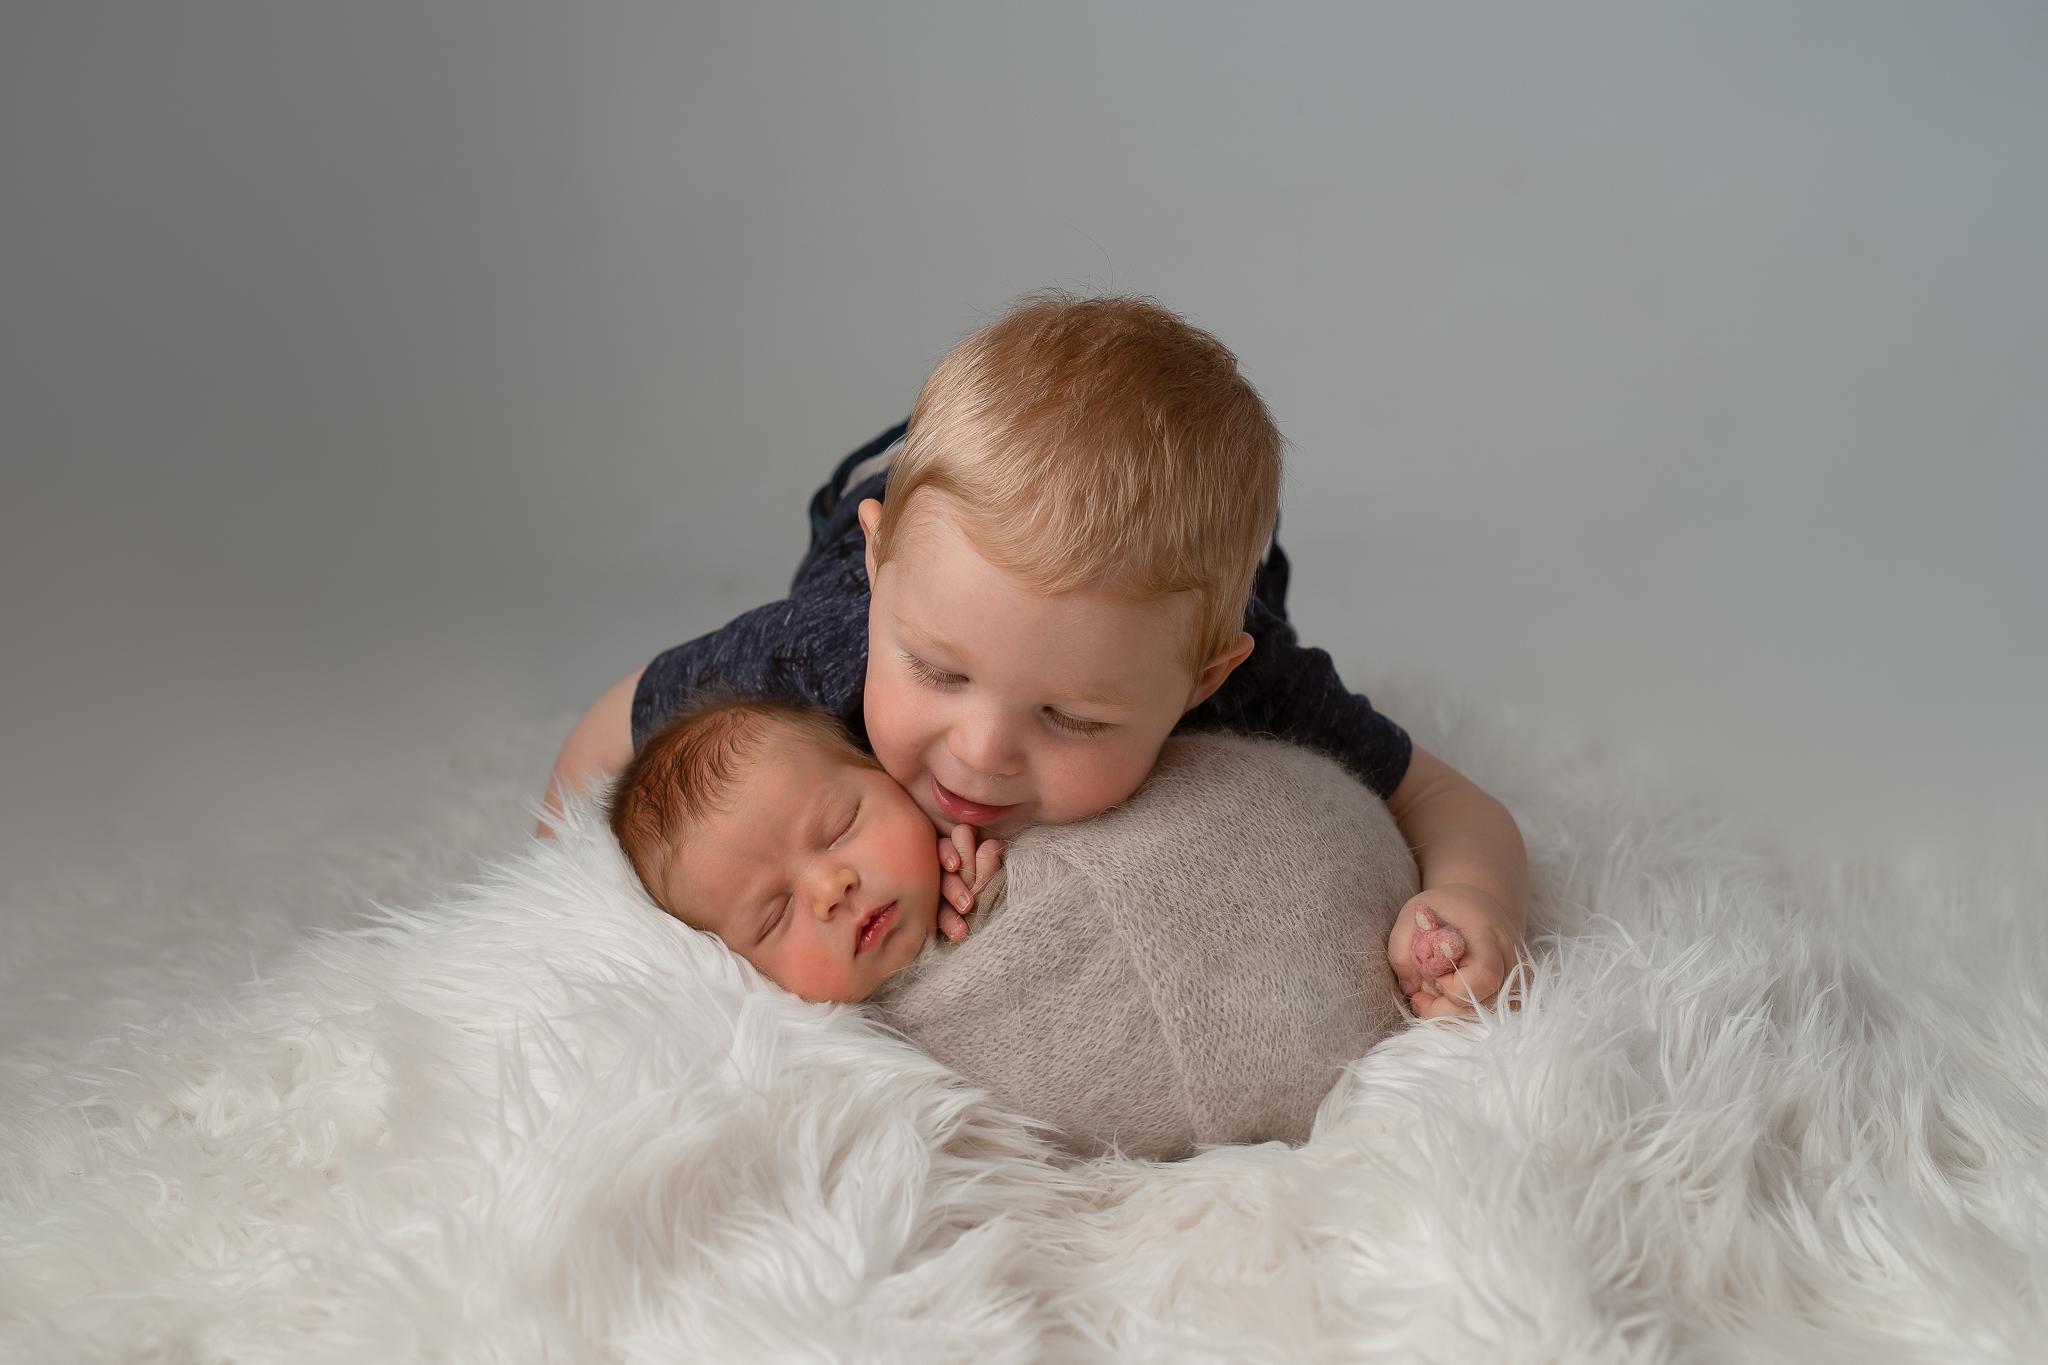 Newborn134NaomiLuciennePhotography062019-Edita-2.jpg